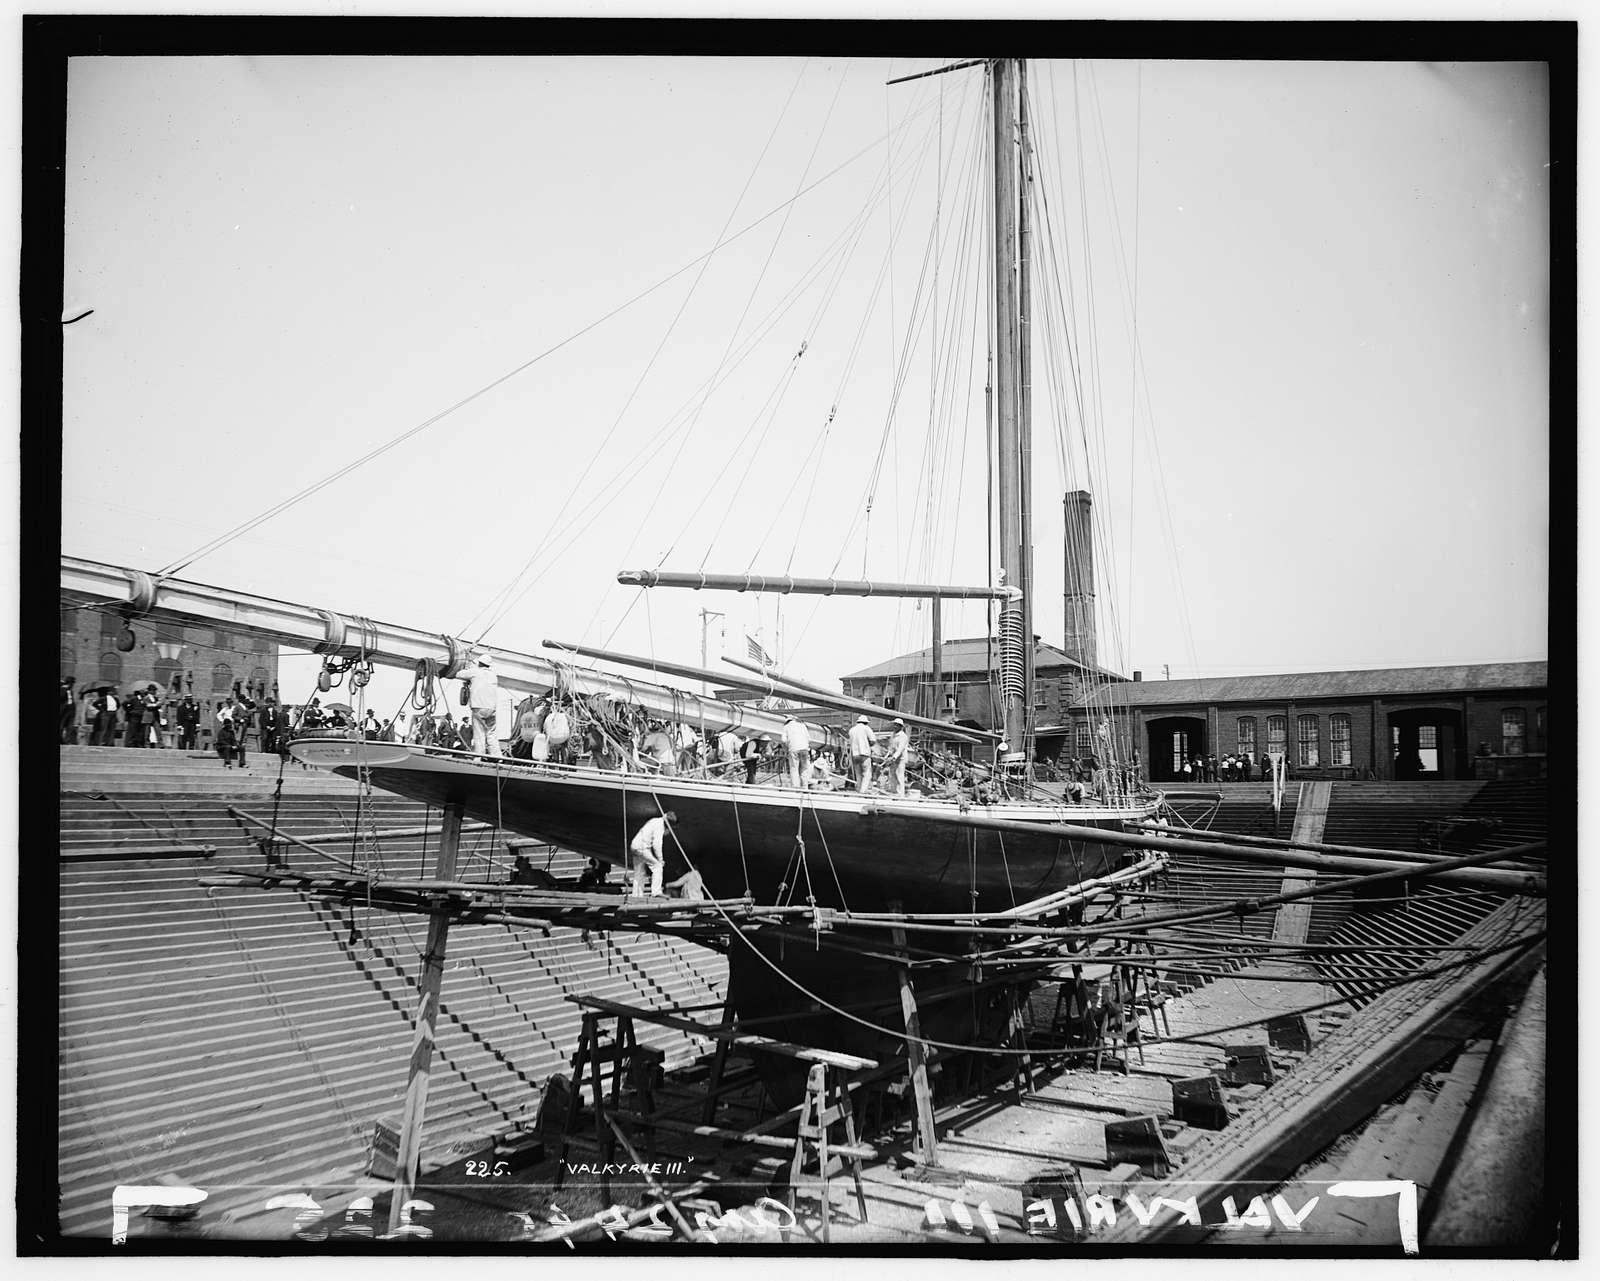 Valkyrie III in Erie Basin